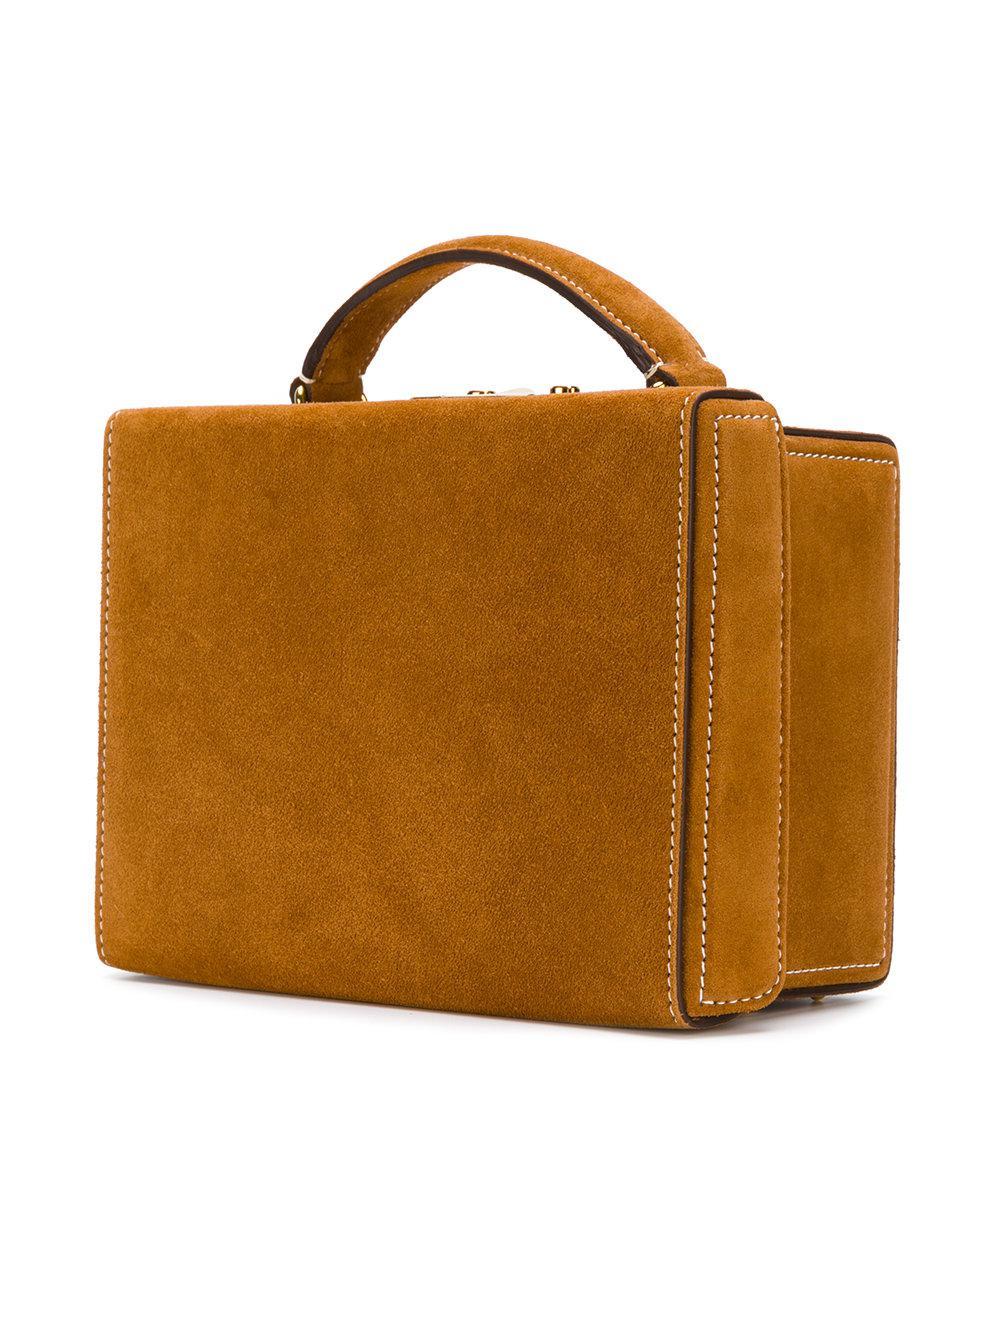 Mark Cross Suede Structured Box Handbag in Brown